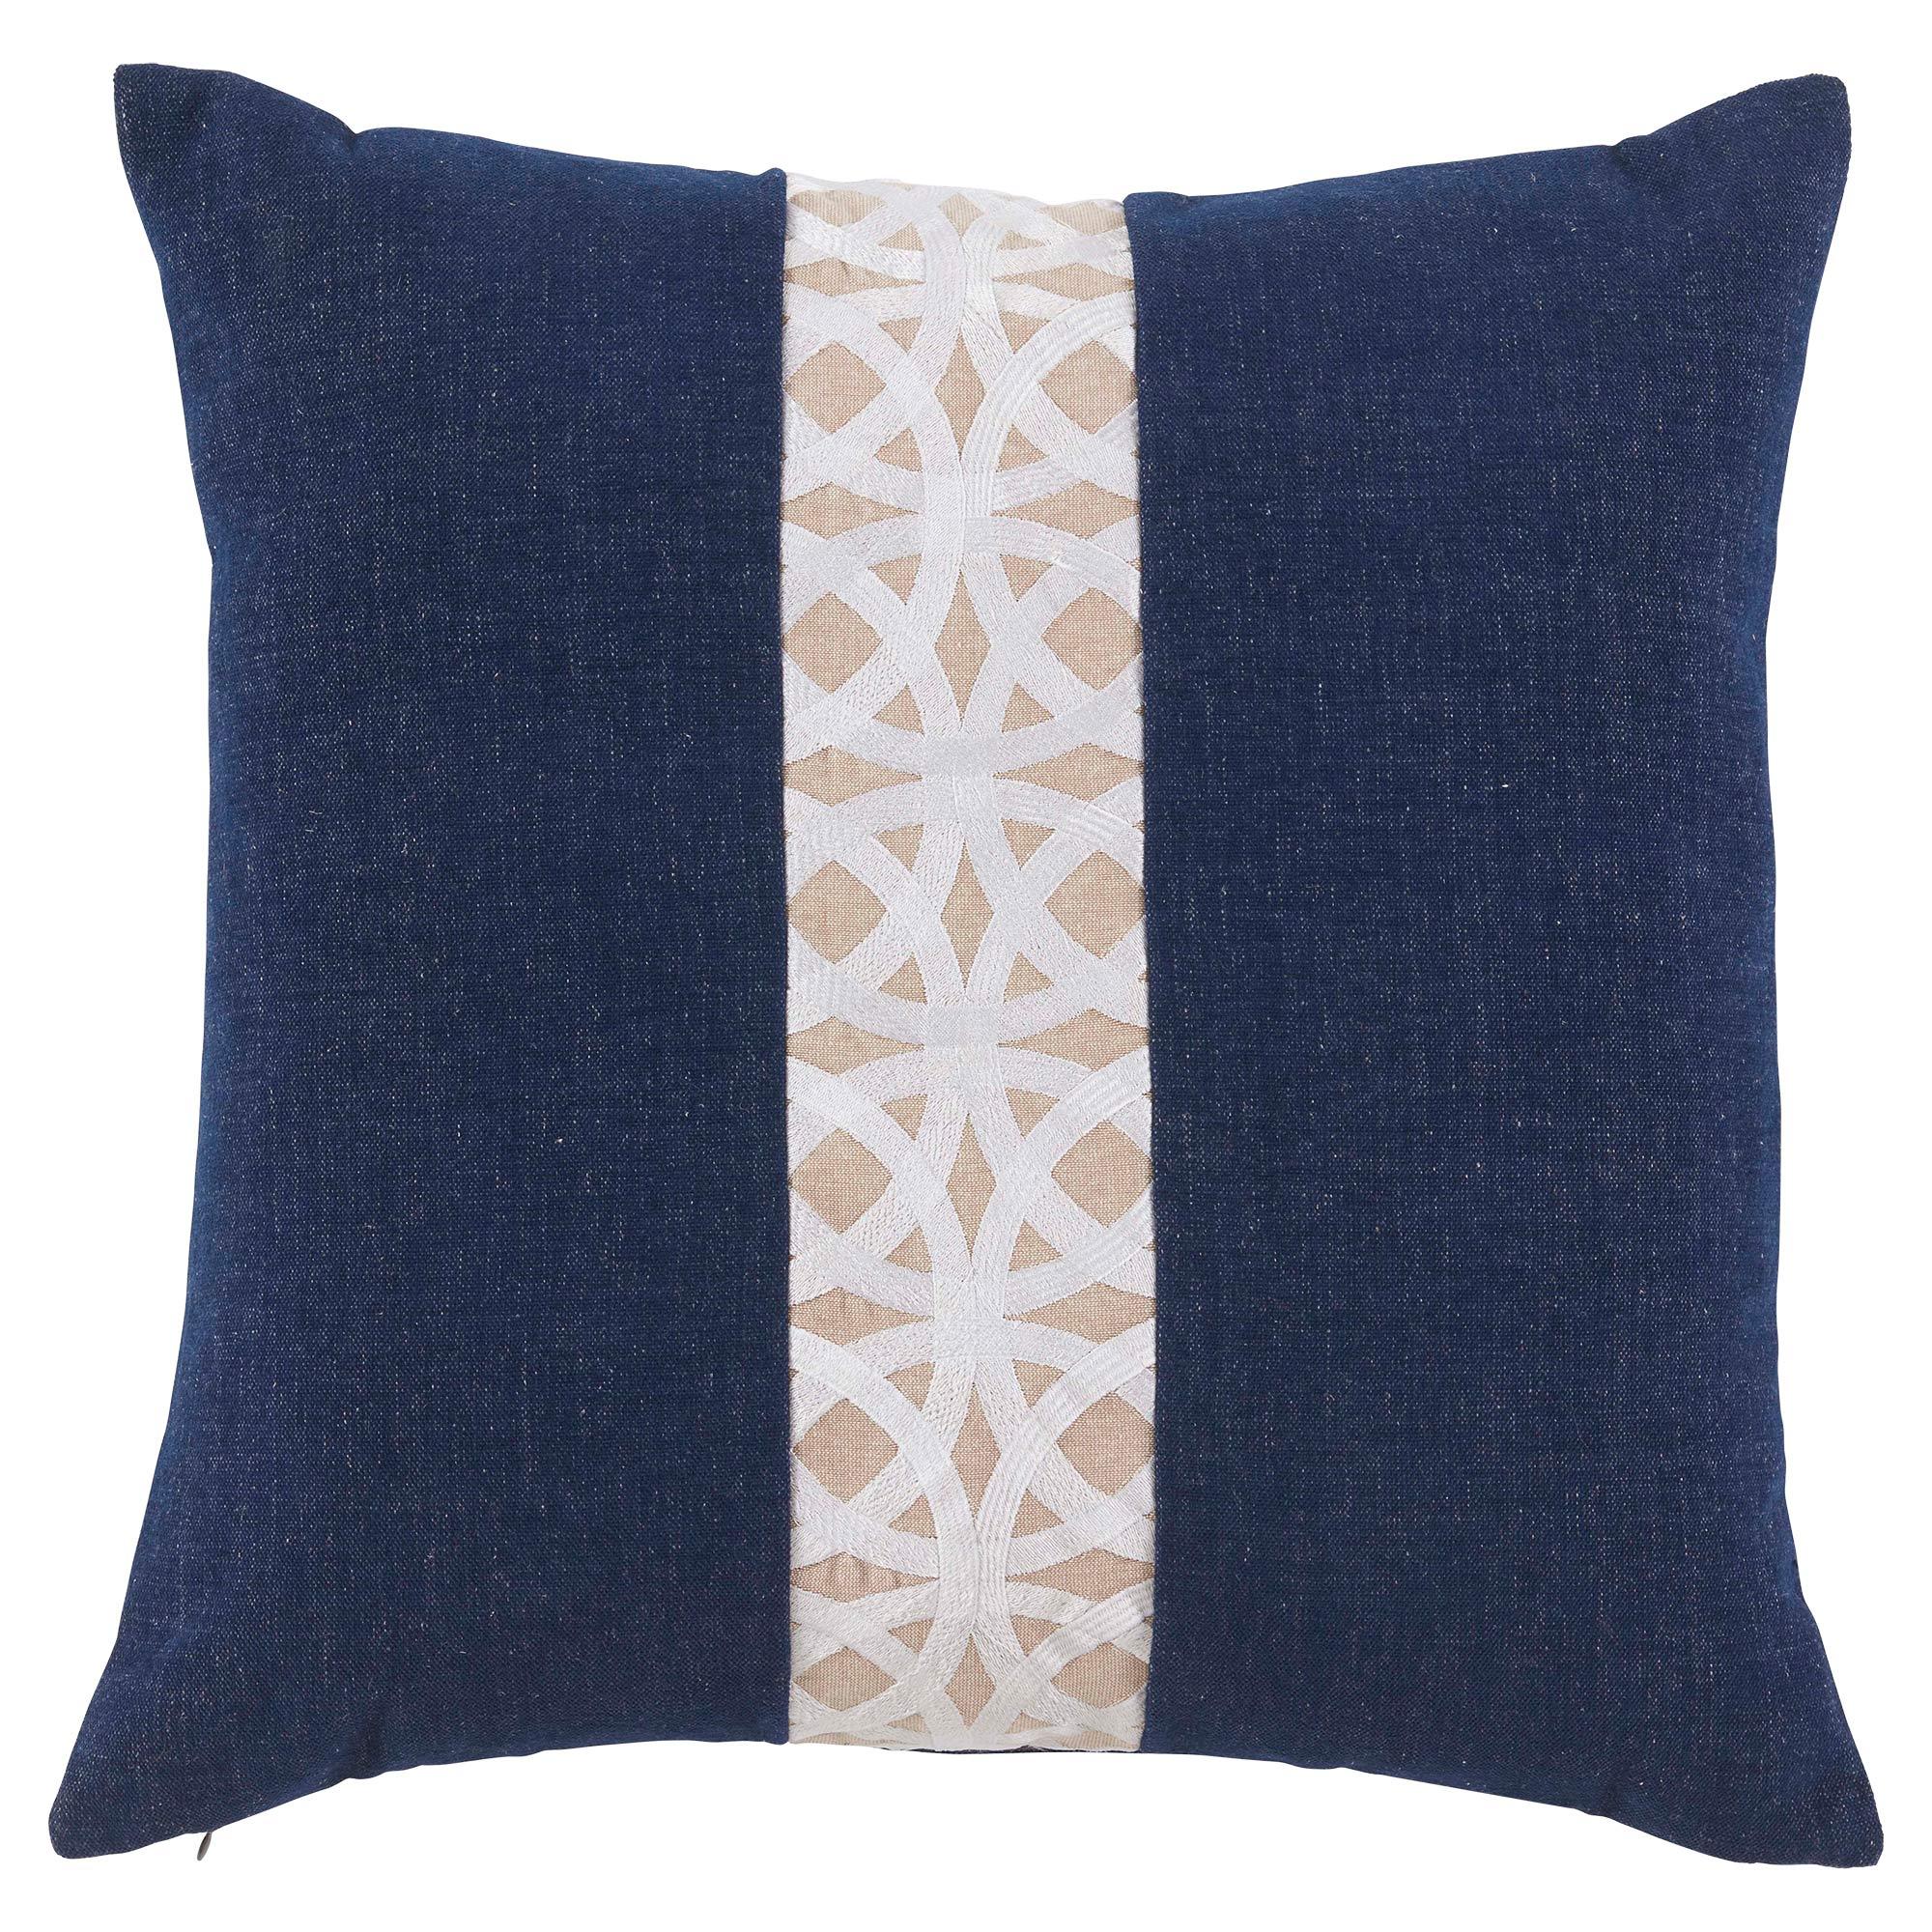 Dorsa Coastal Trellis Stripe Navy Blue Pillow - 22x22